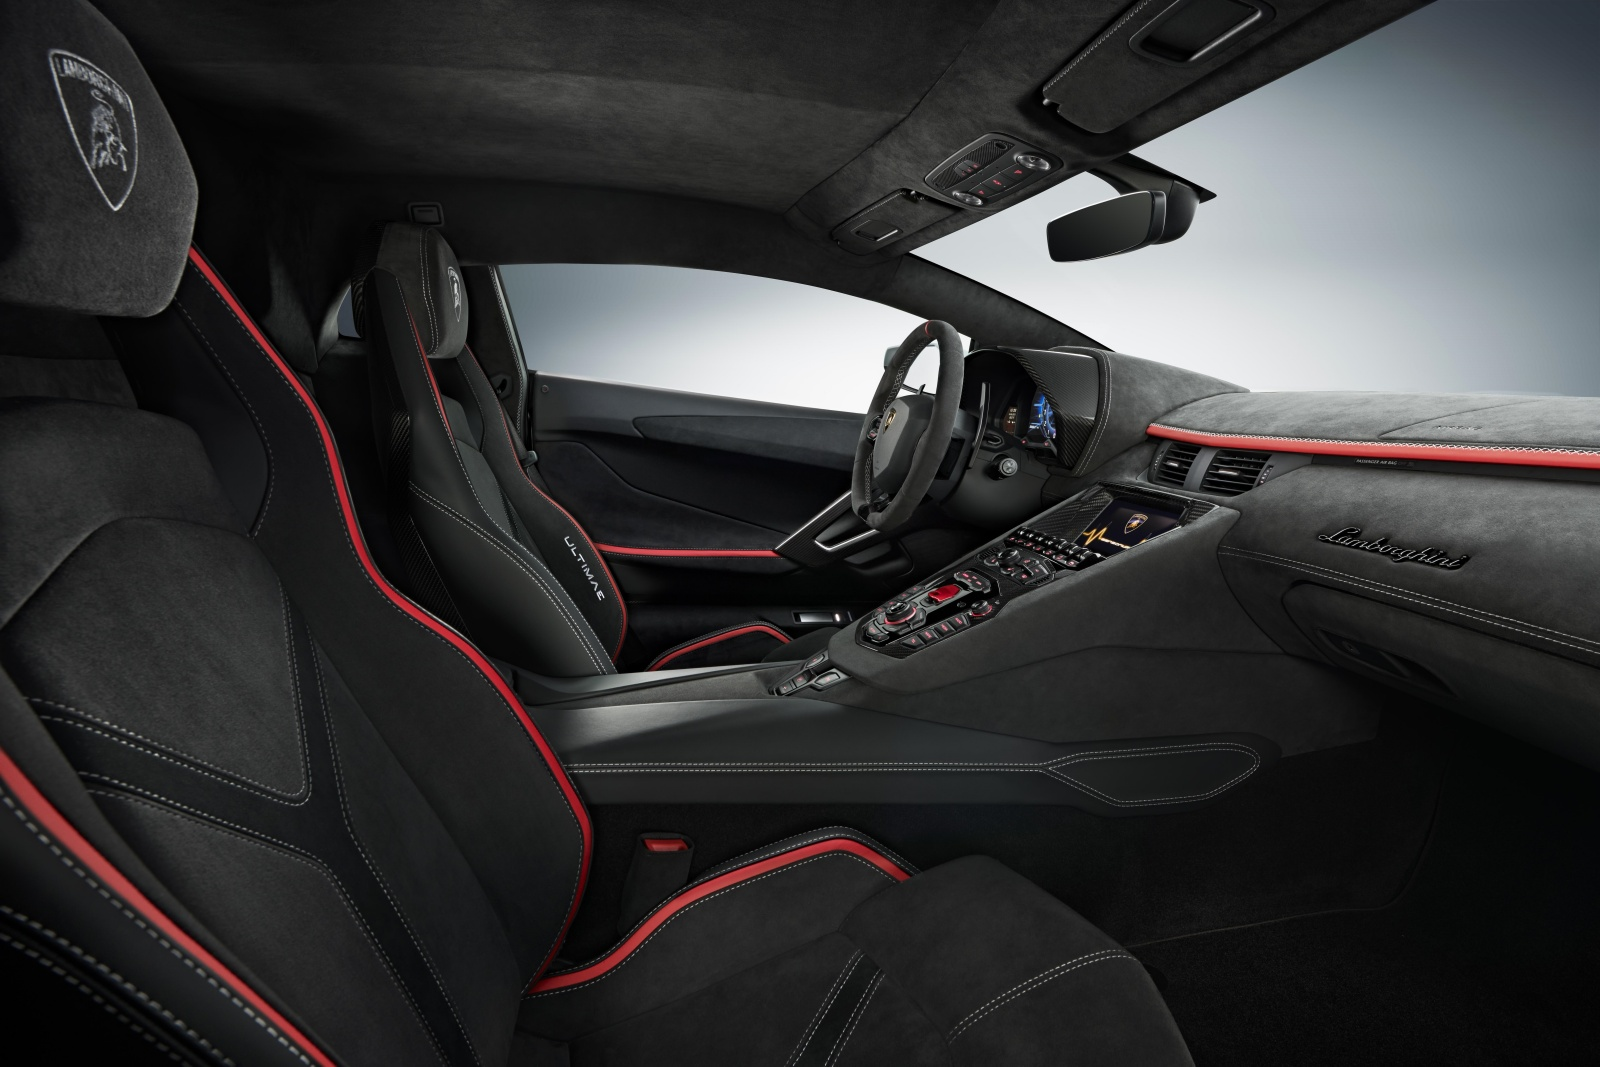 Lamborghini Aventador LP 780-4 Ultimae coupe - wnętrze, deska rozdzielcza